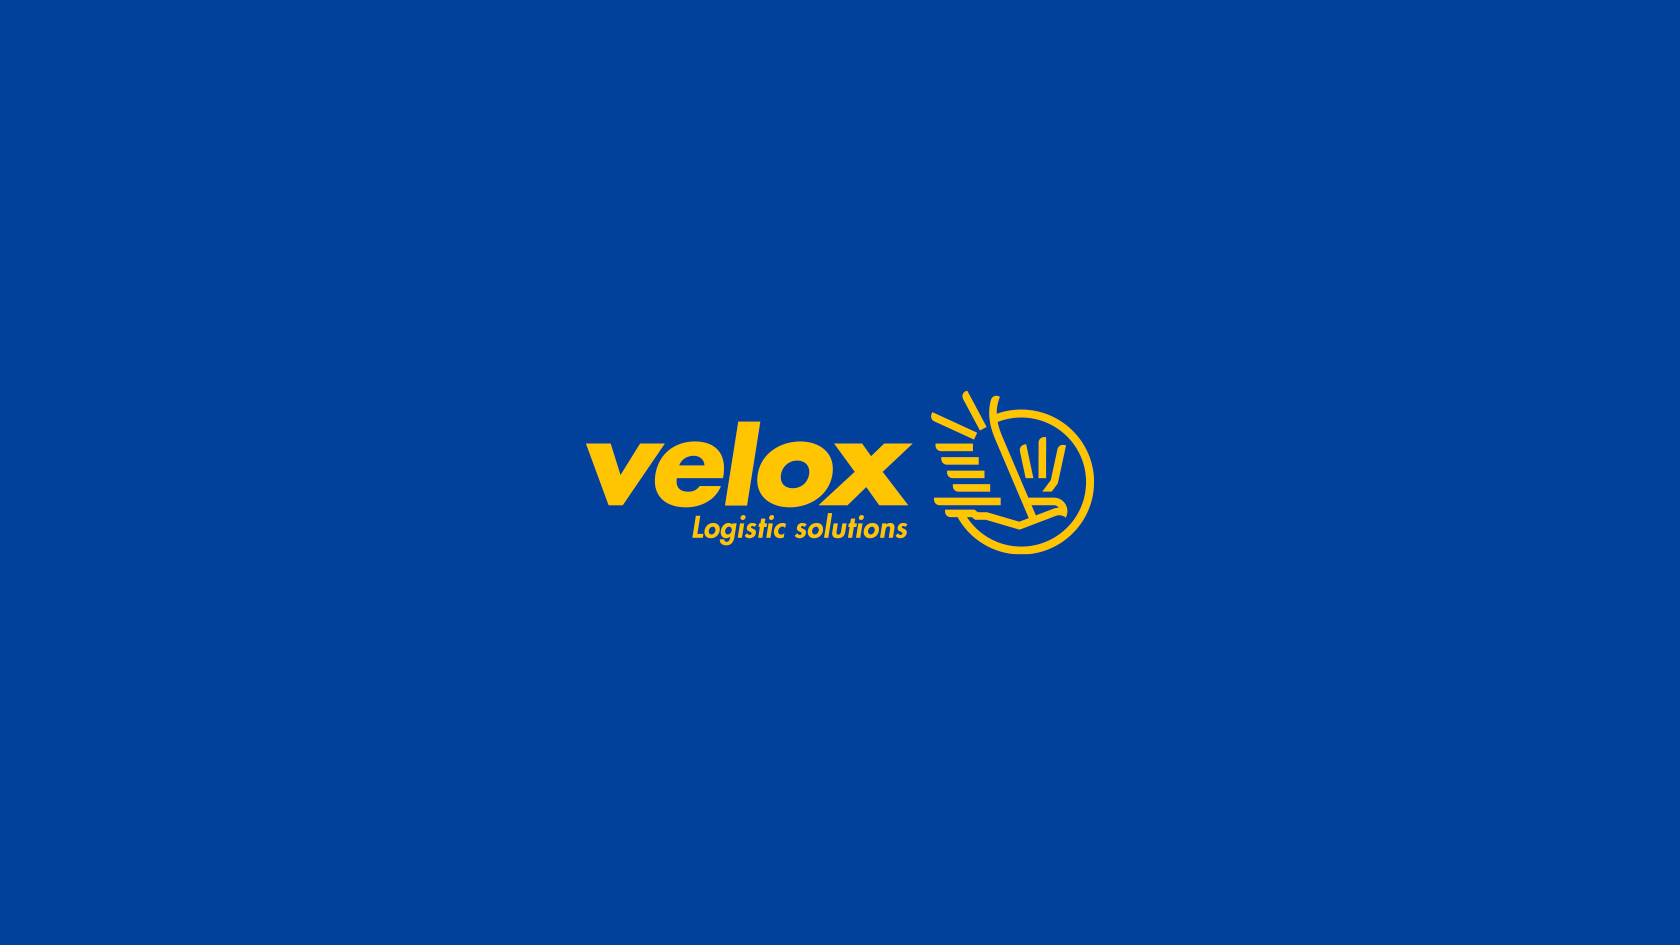 pixelarte-diseno-grafico-logotipo-Velox-logistic-solutions